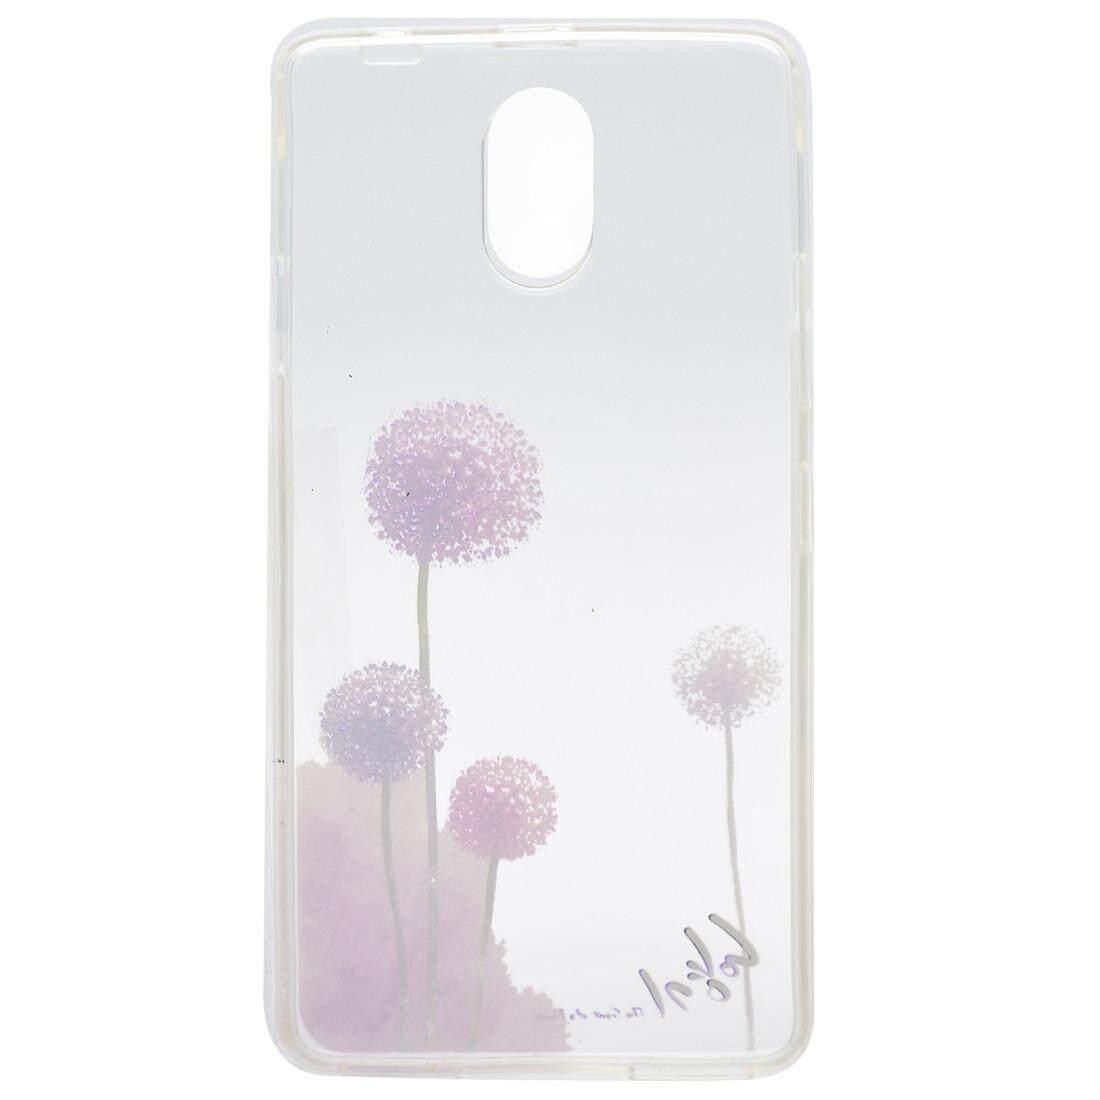 ... For Lenovo VIBE P1m Dandelion Pattern Transparent Soft TPU Protective Back Cover Case - intl ...